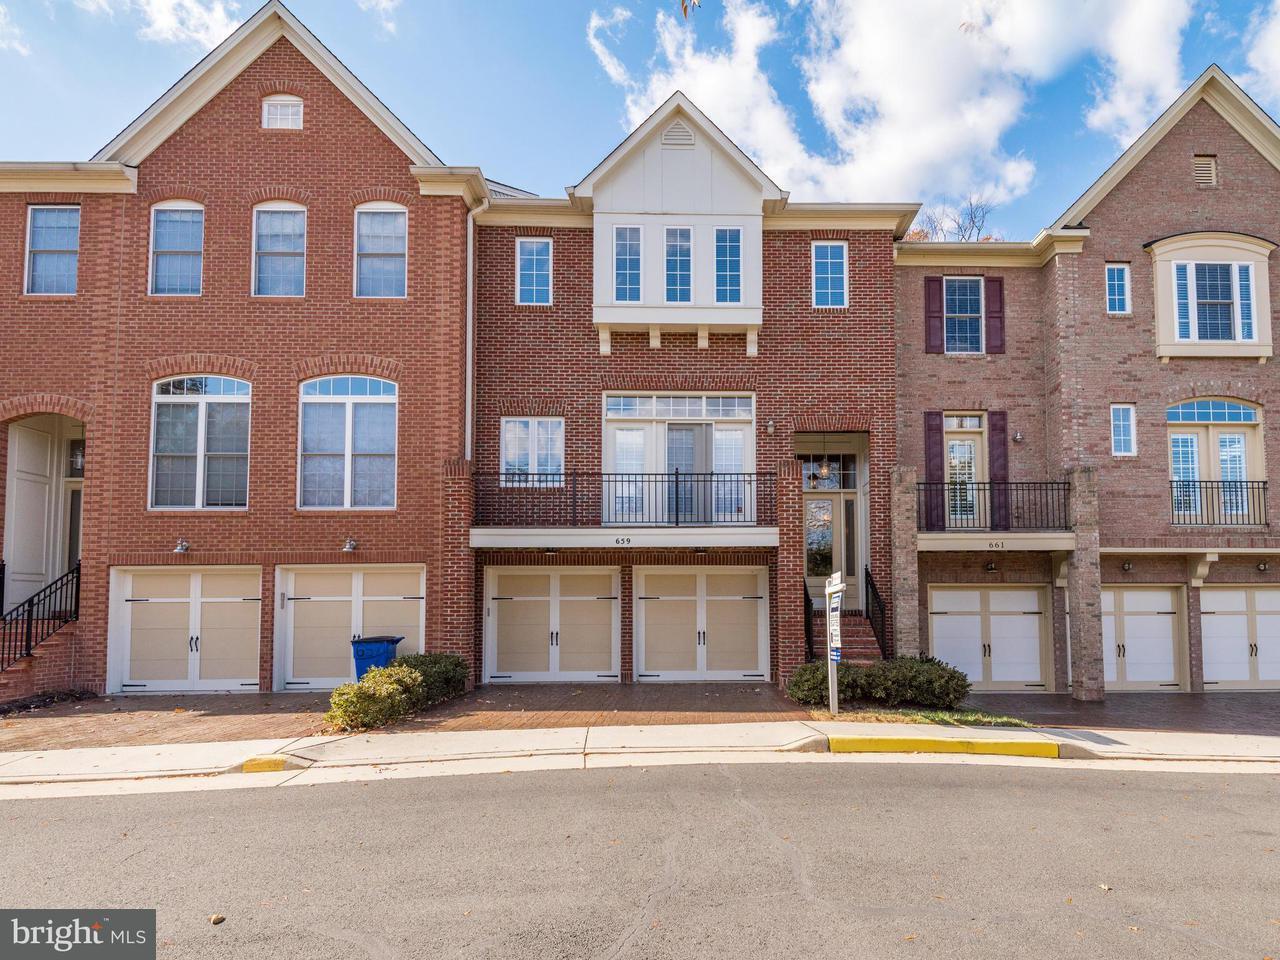 Townhouse for Sale at 659 NATHANIEL CHASE Lane 659 NATHANIEL CHASE Lane Herndon, Virginia 20170 United States